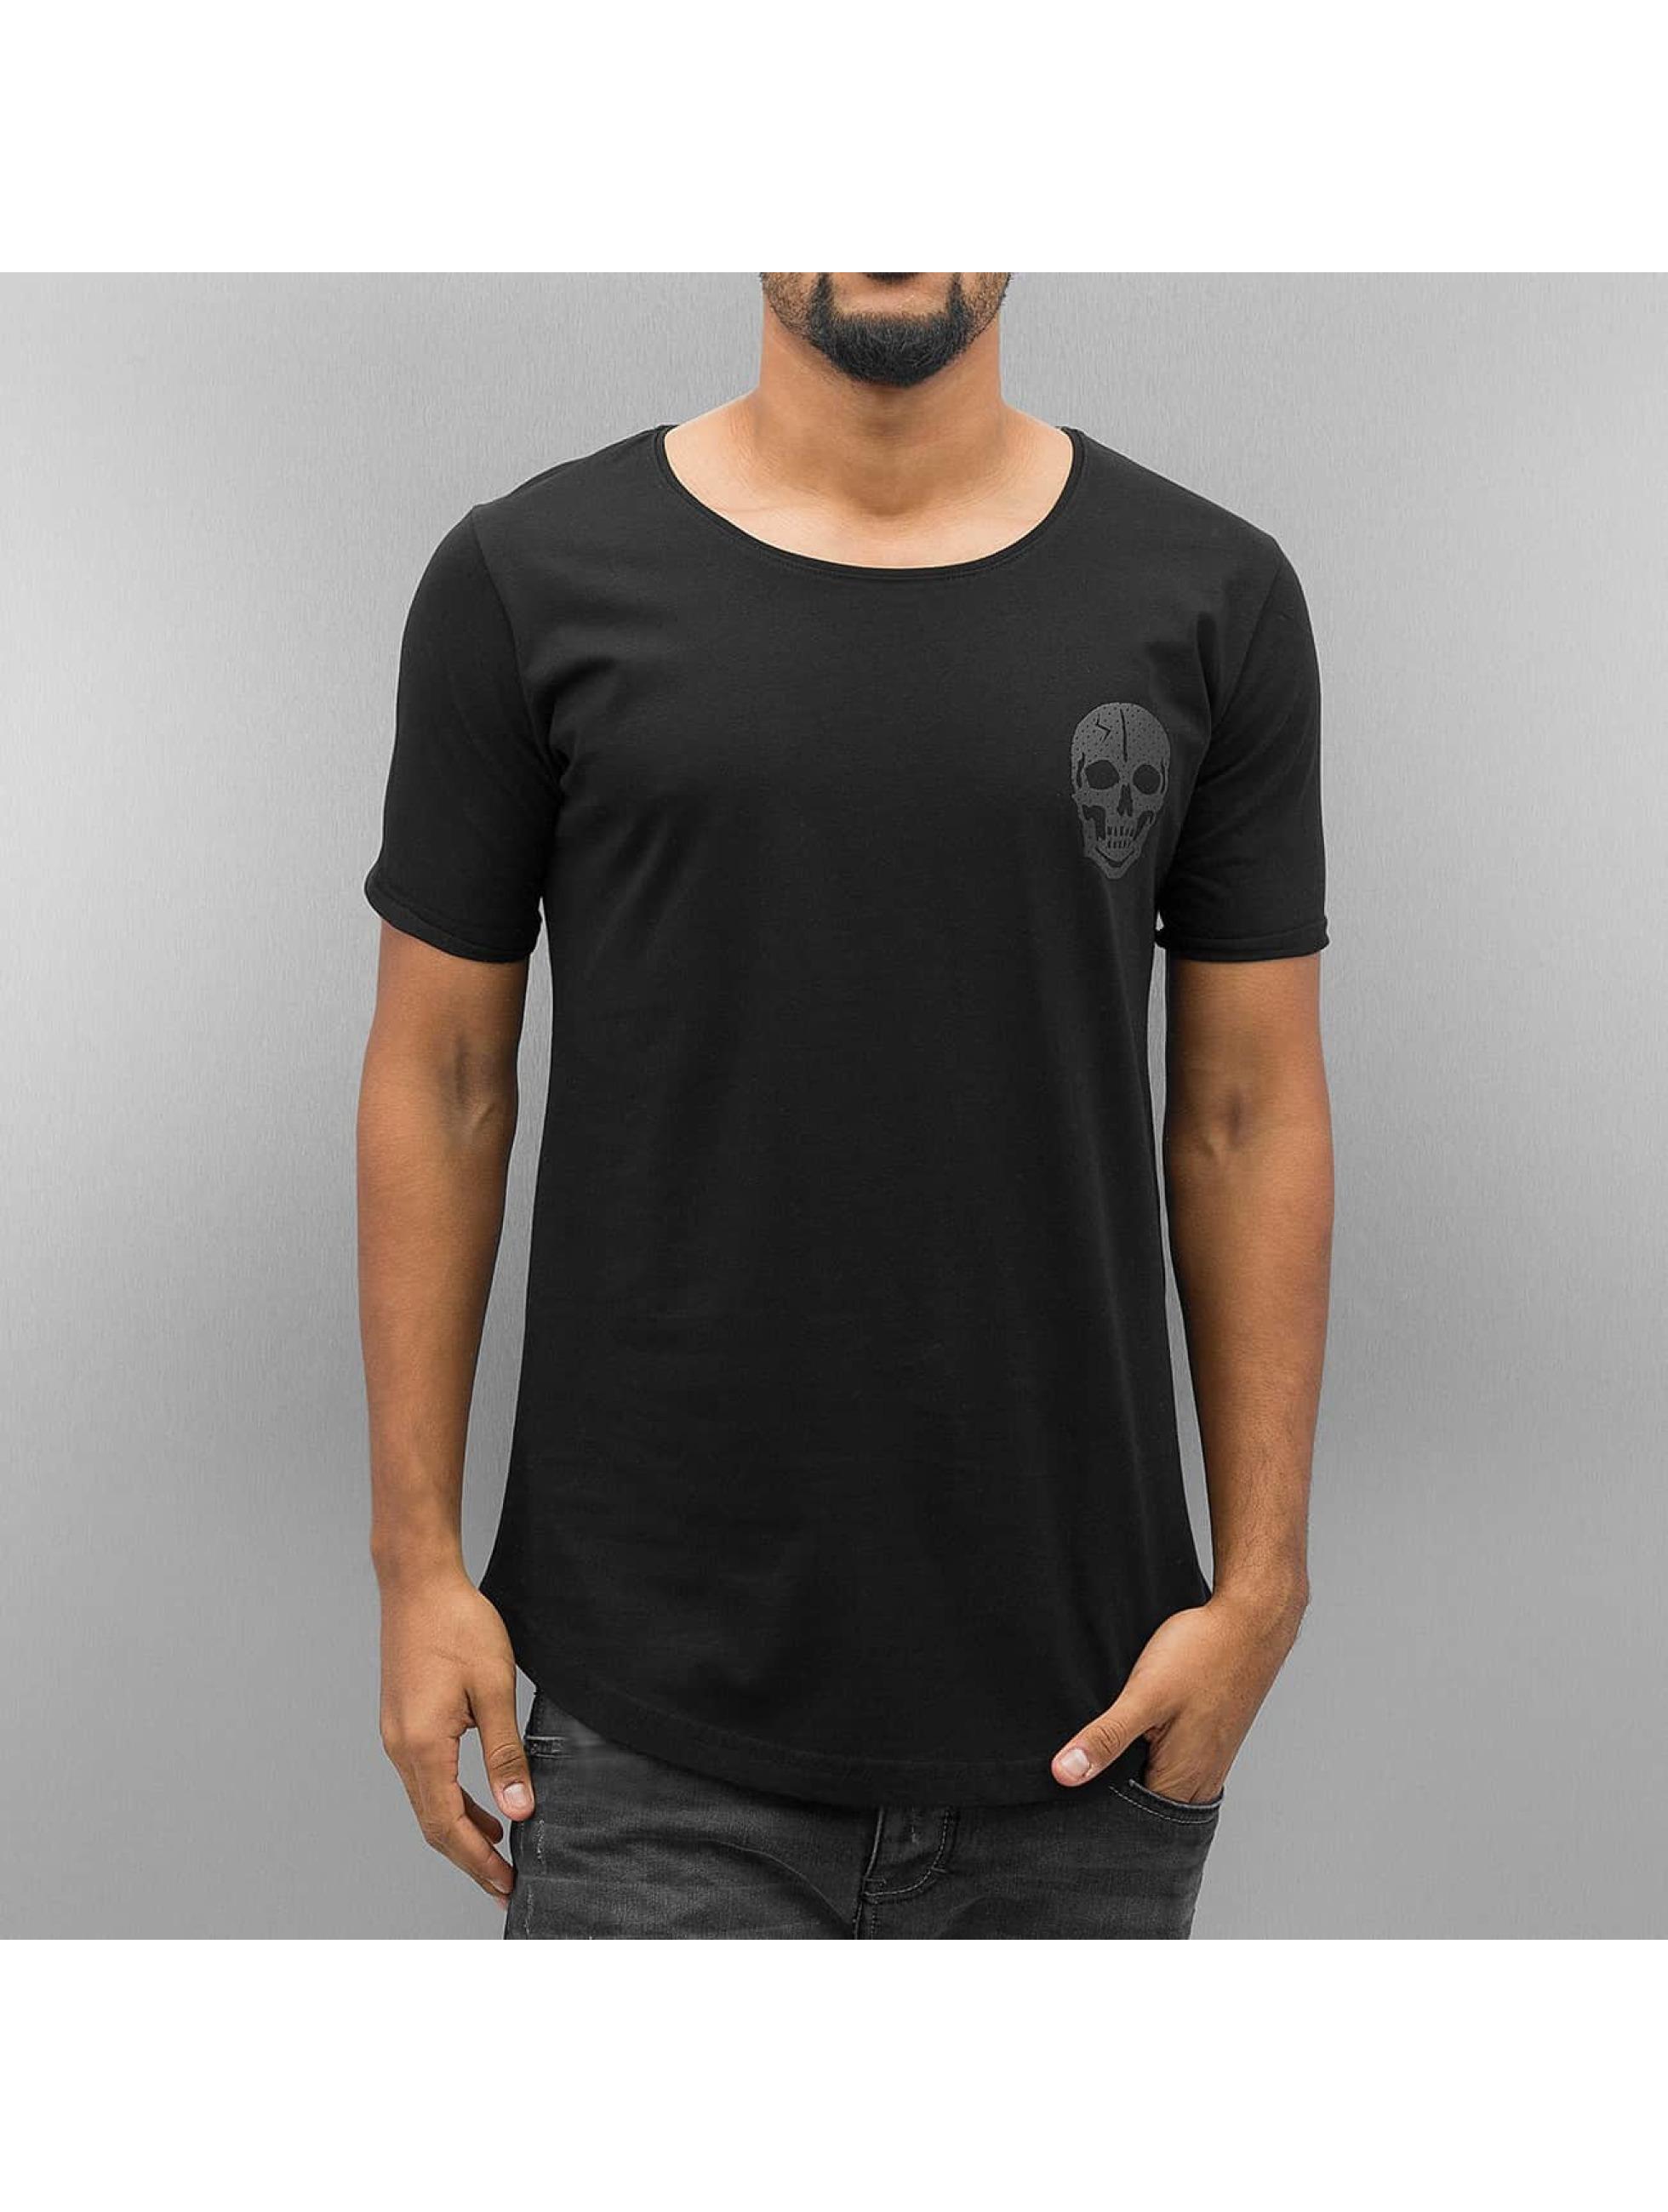 2Y T-shirt Face nero